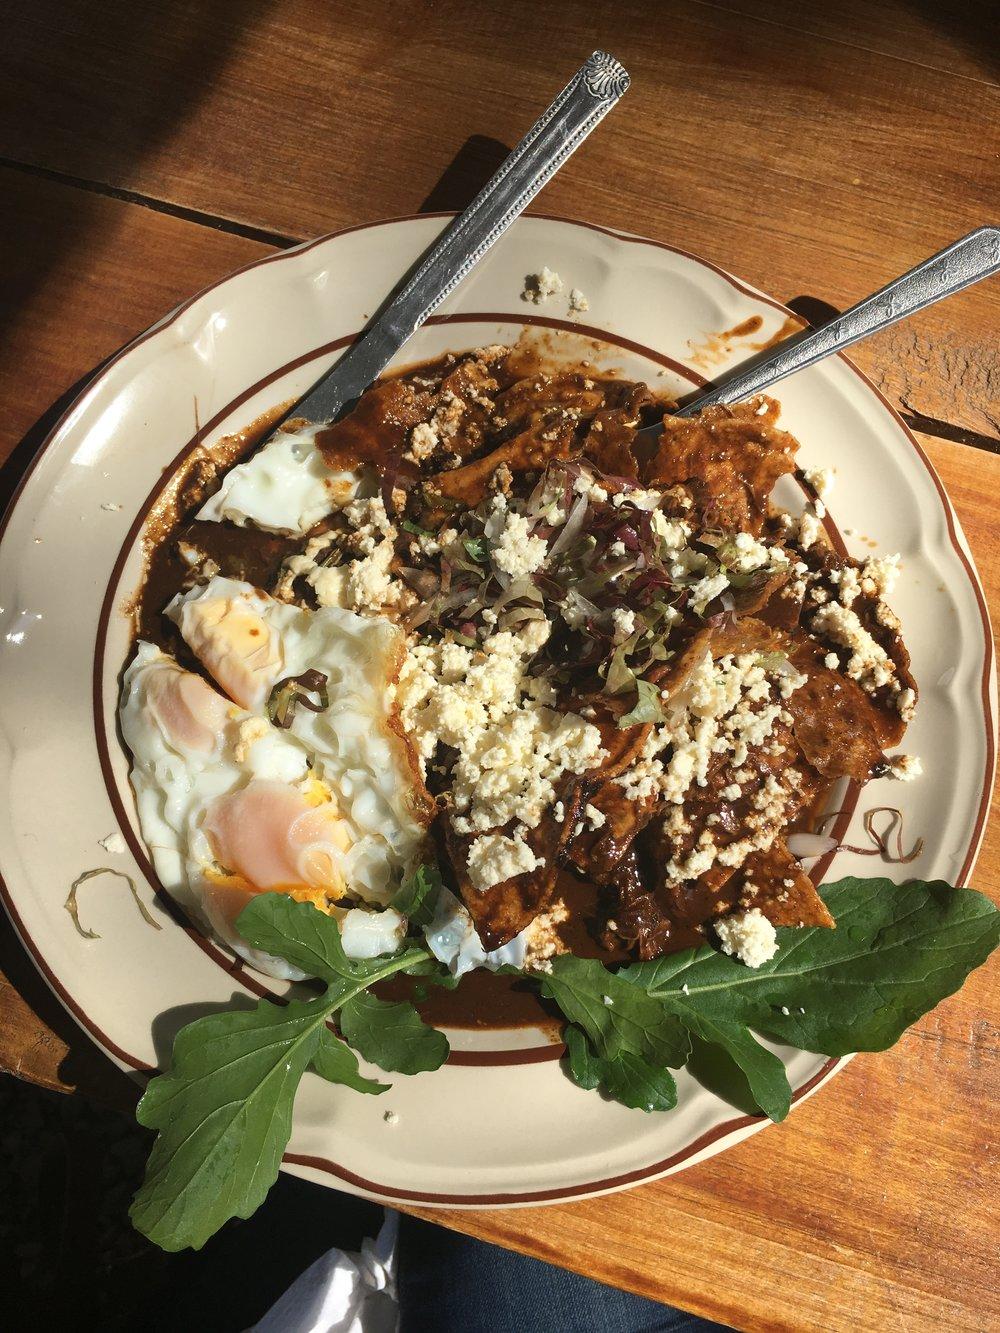 Meal at La Cosecha